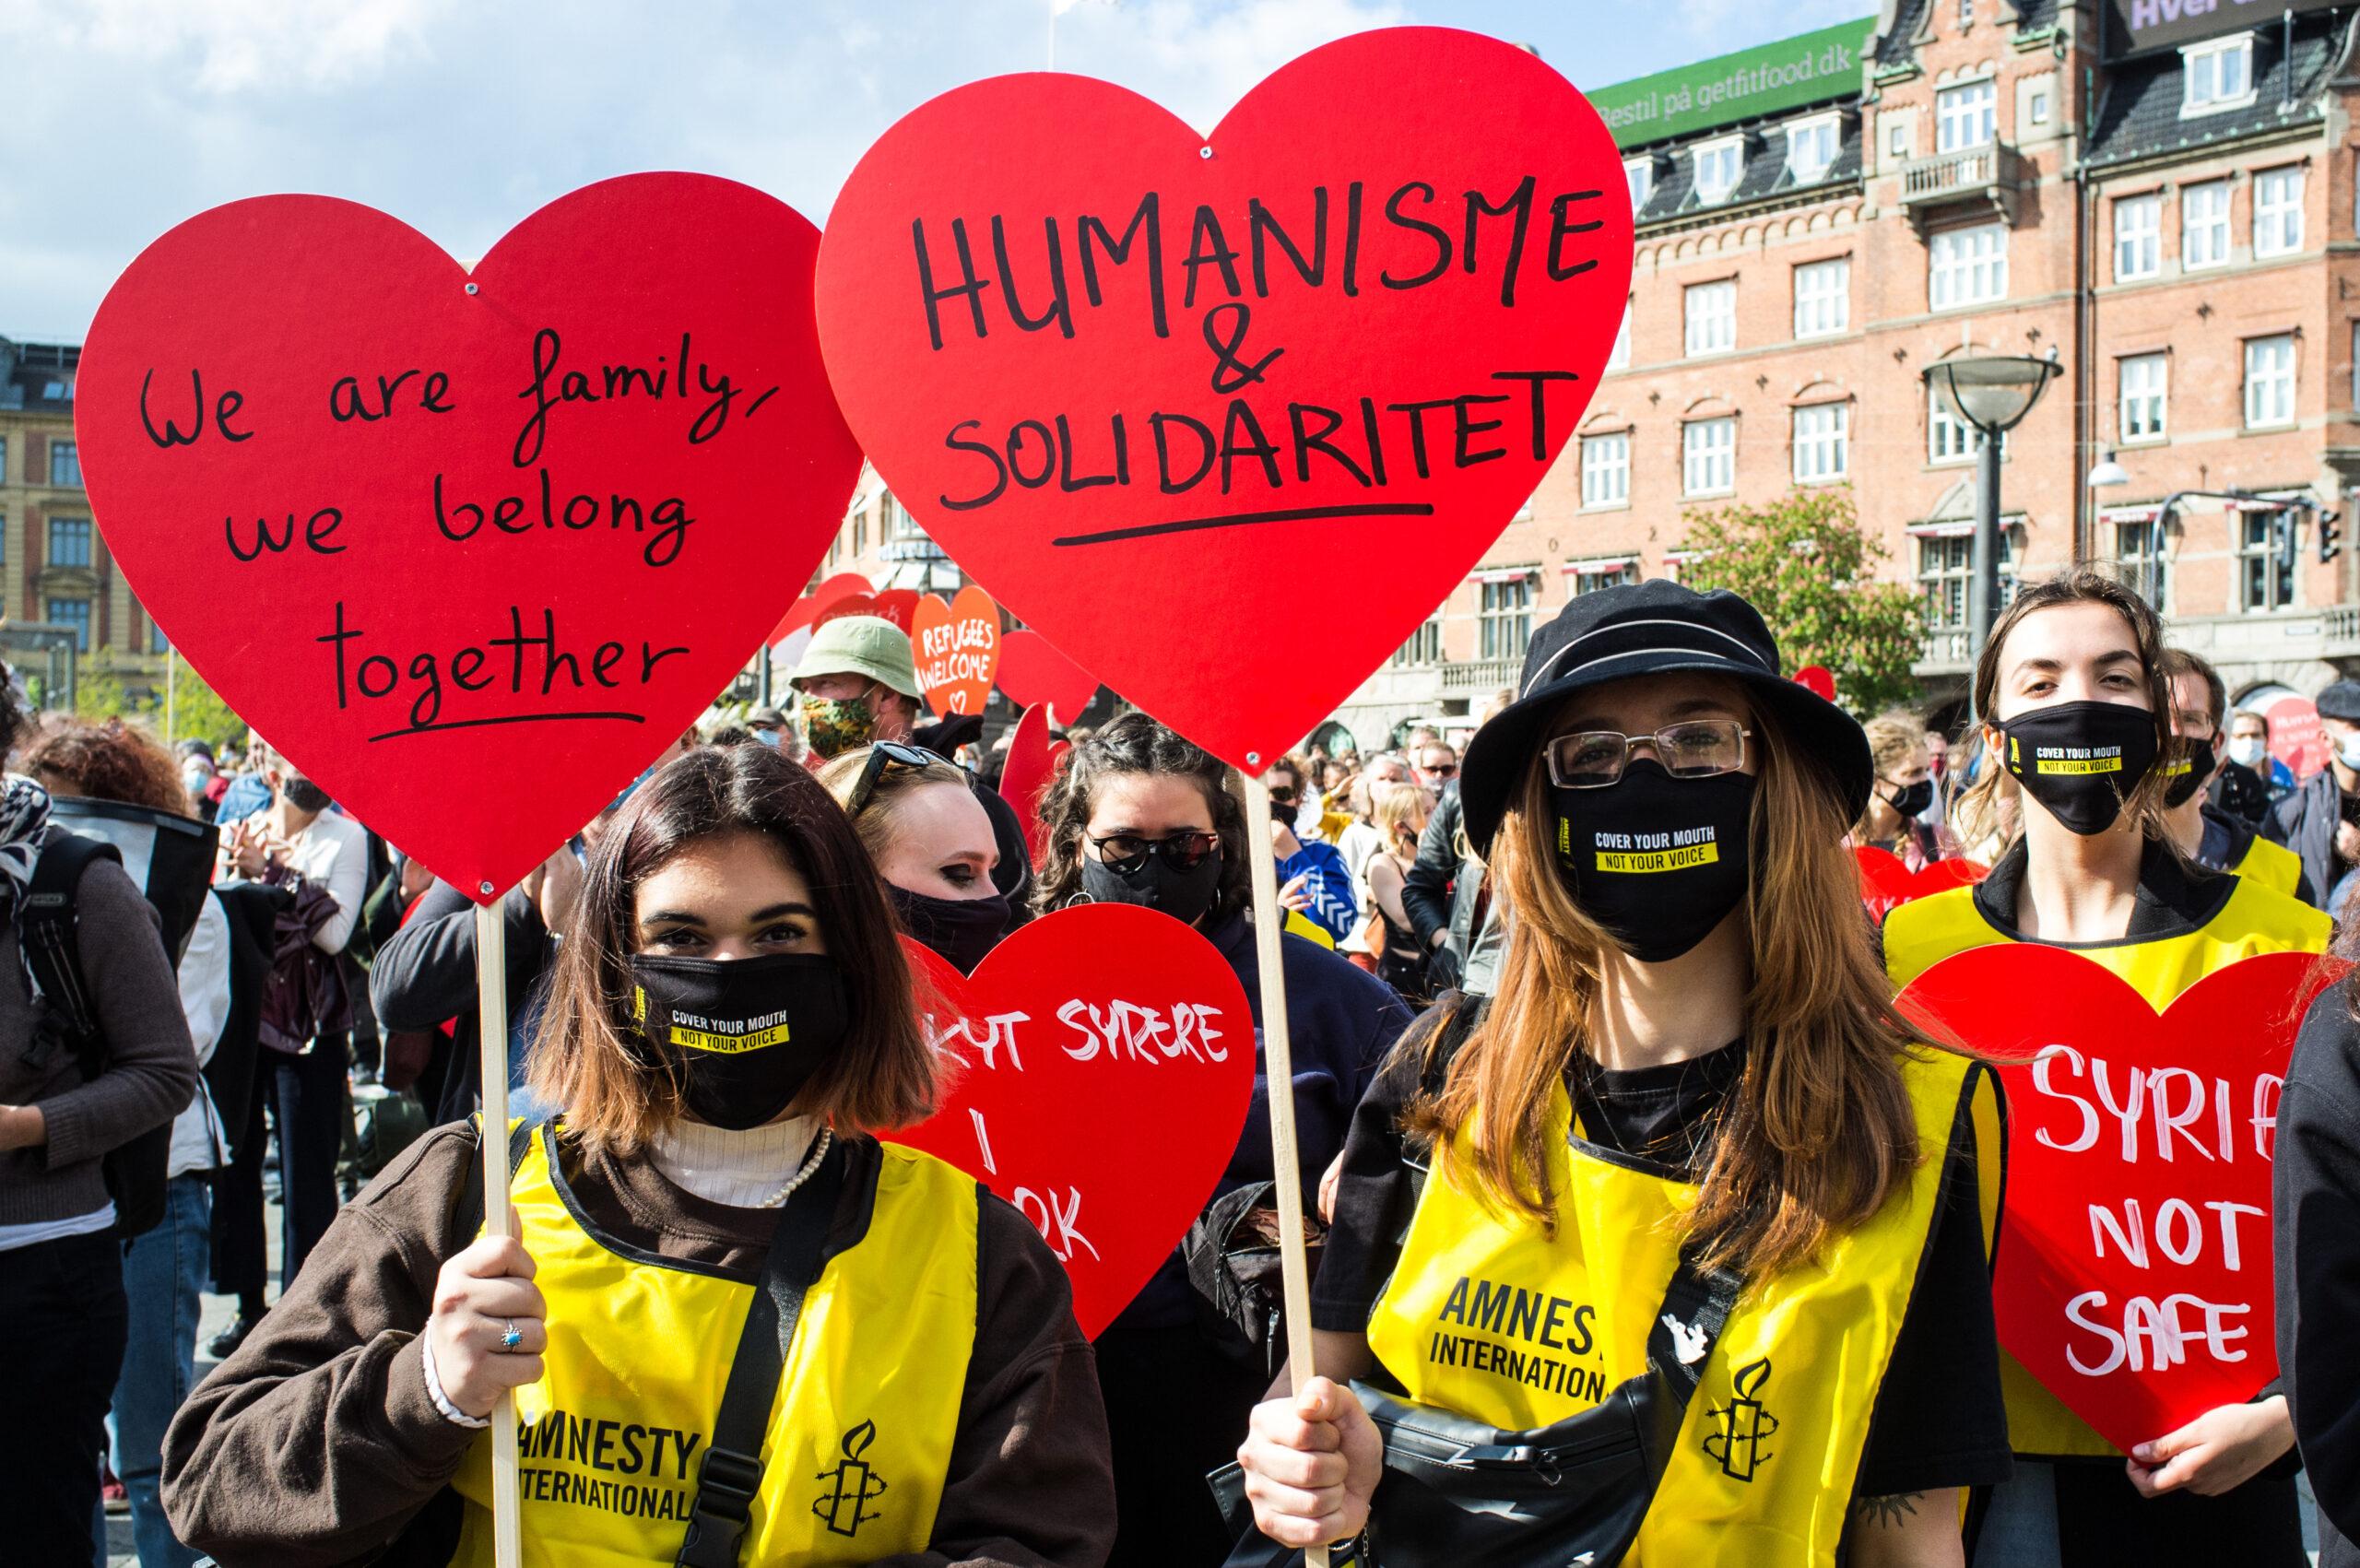 Denmark: Don't send refugees back to Syria